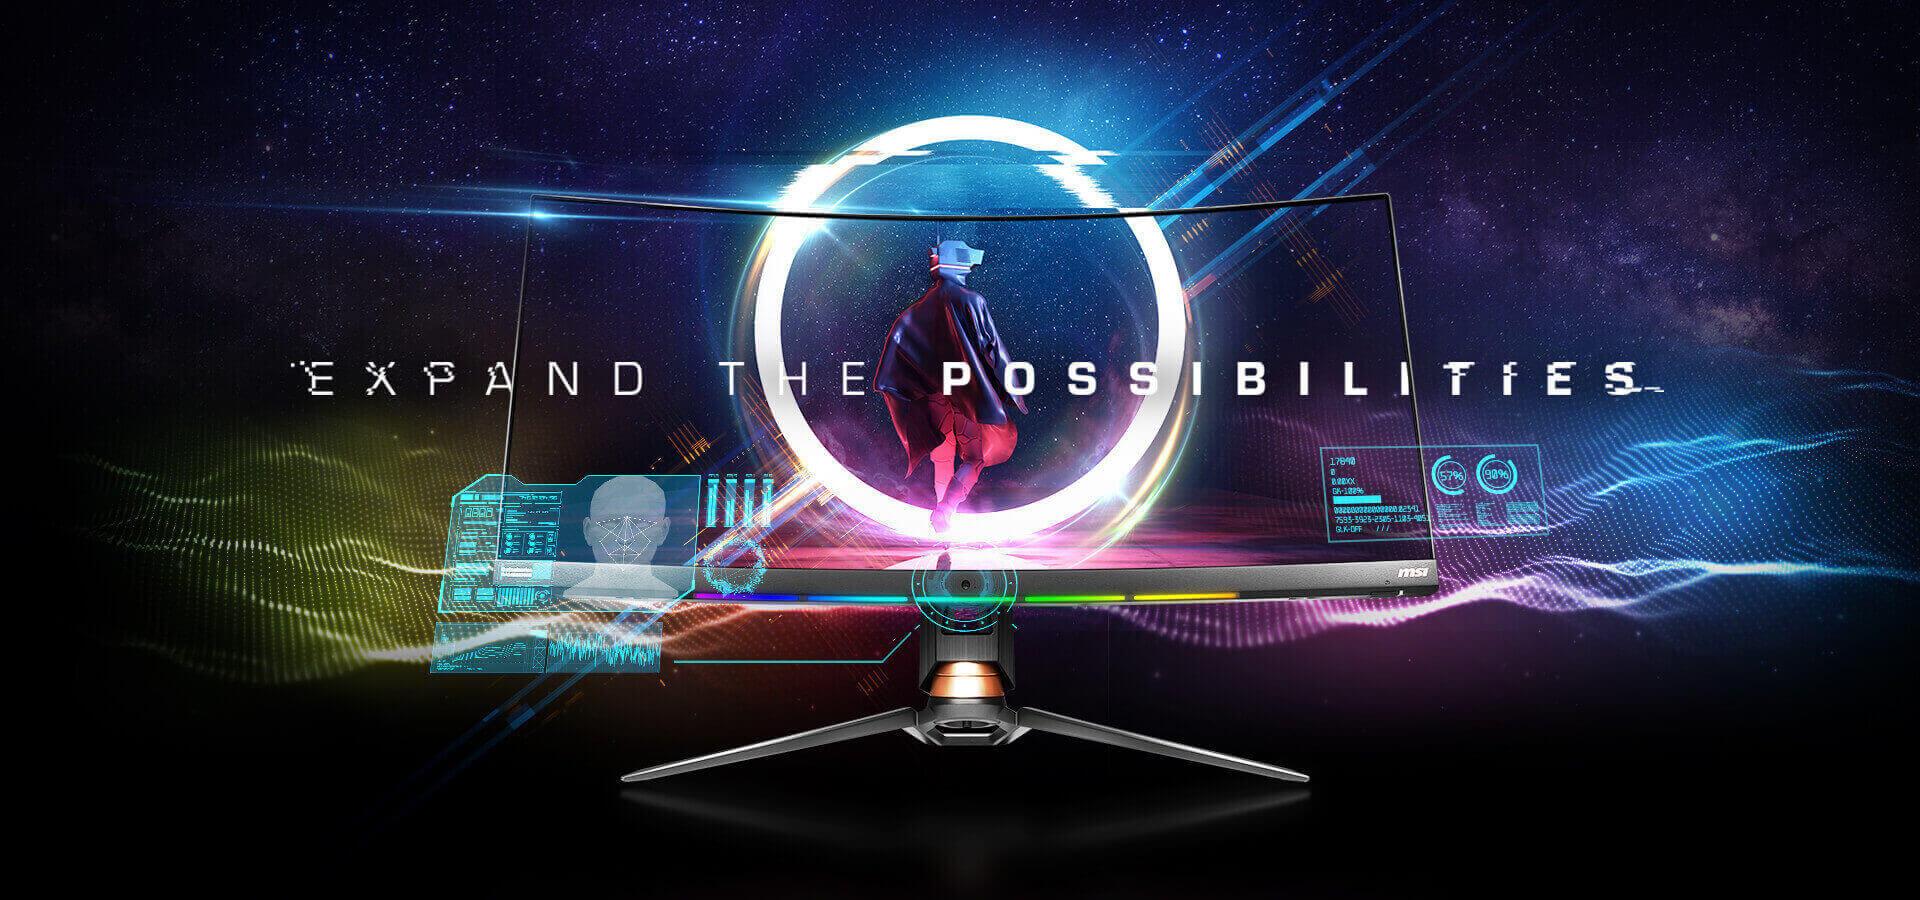 KV, a vivid color image as a monitor screen